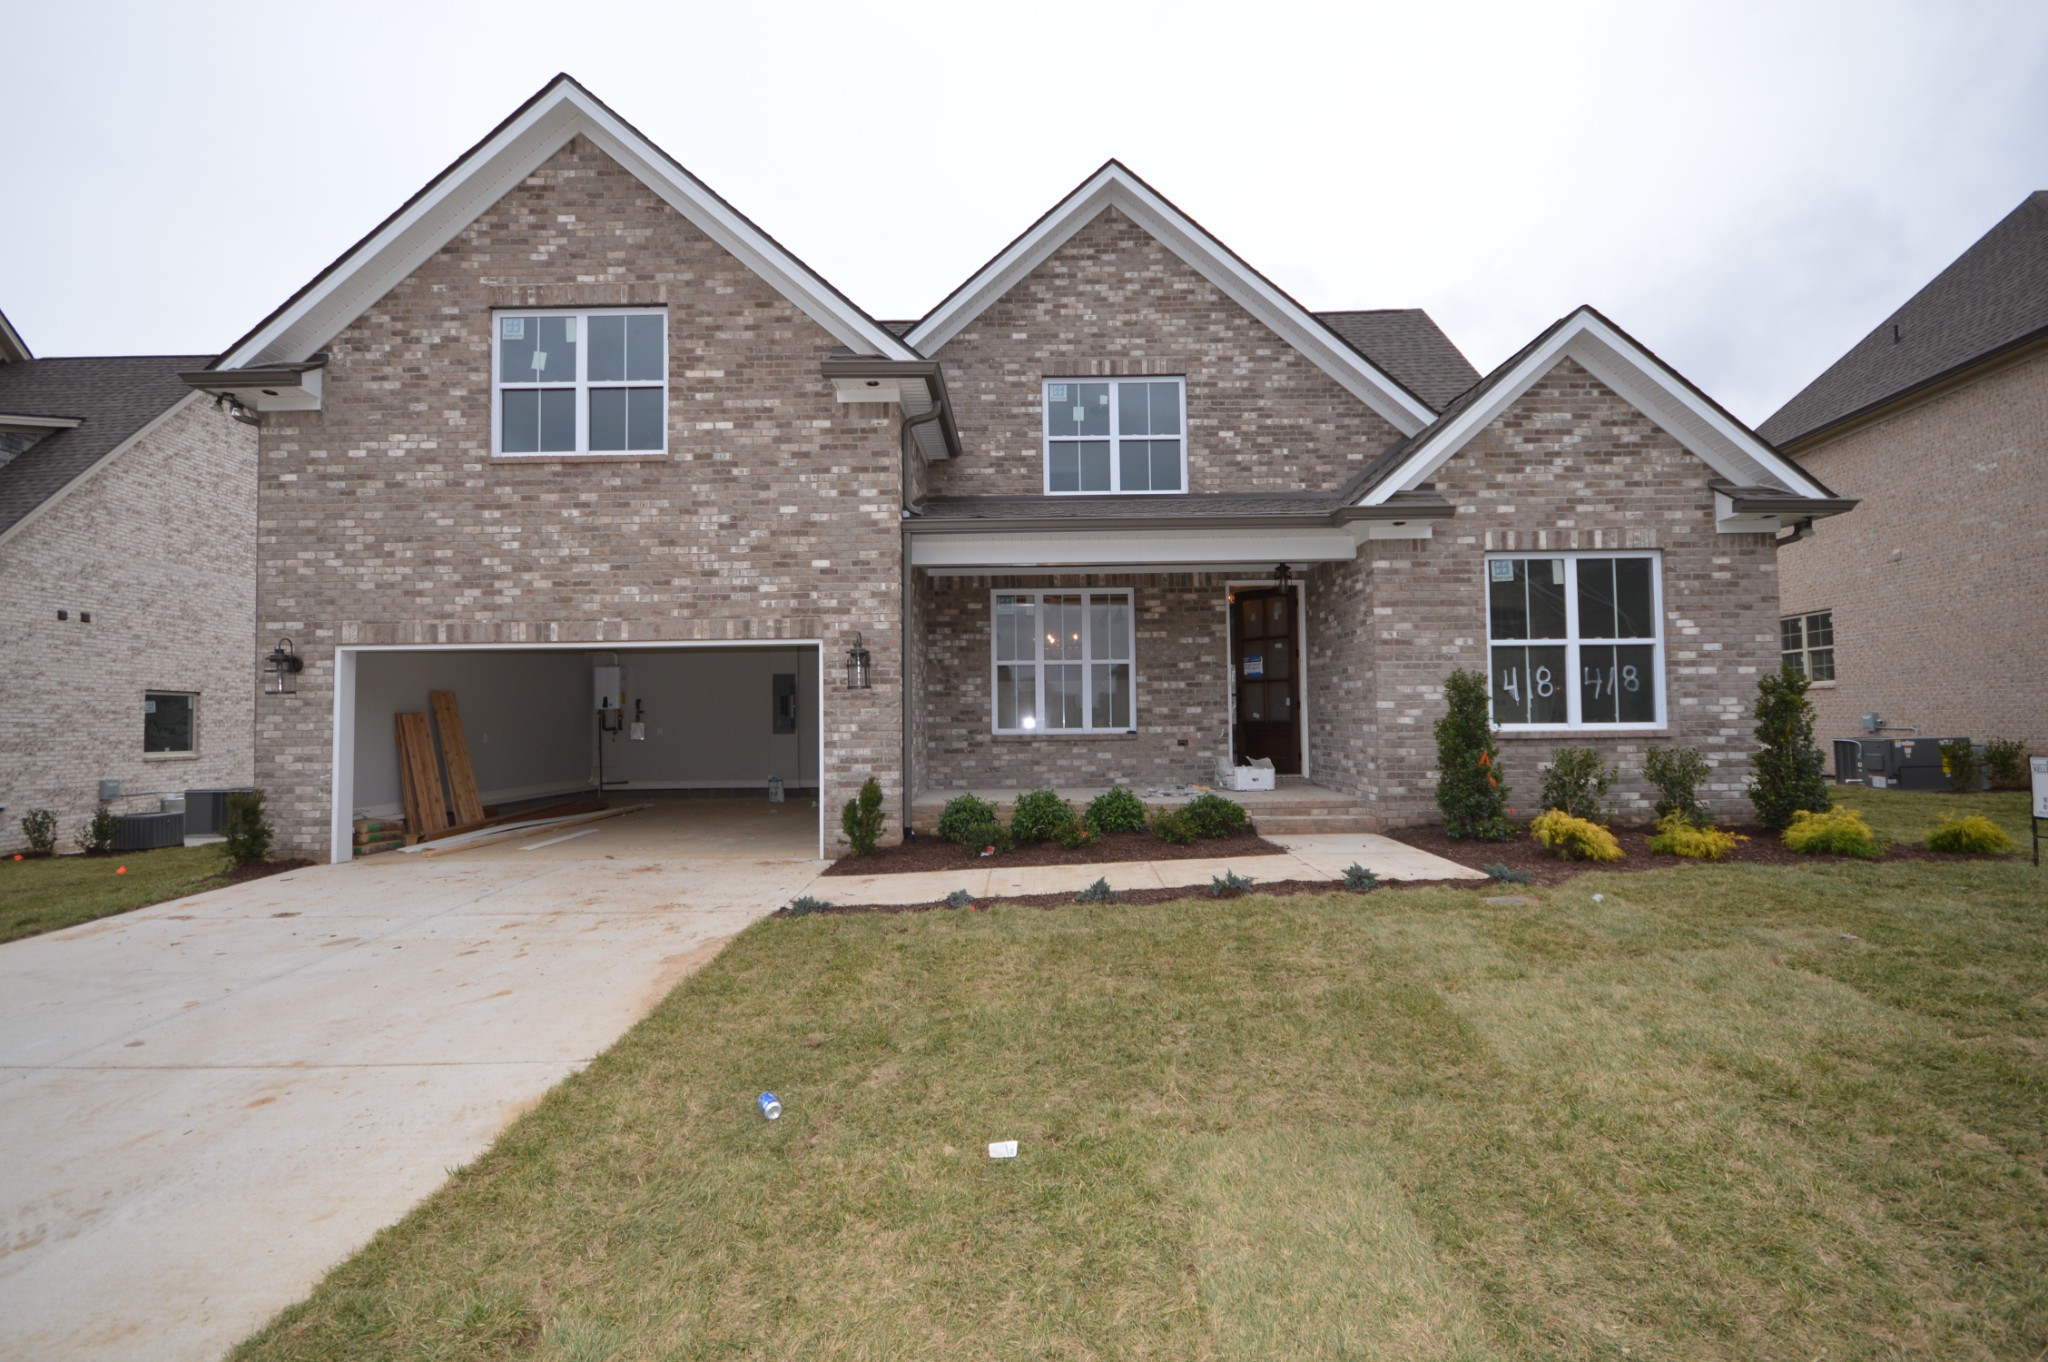 1016 Alpaca Drive (418), Spring Hill, TN 37174 - Spring Hill, TN real estate listing